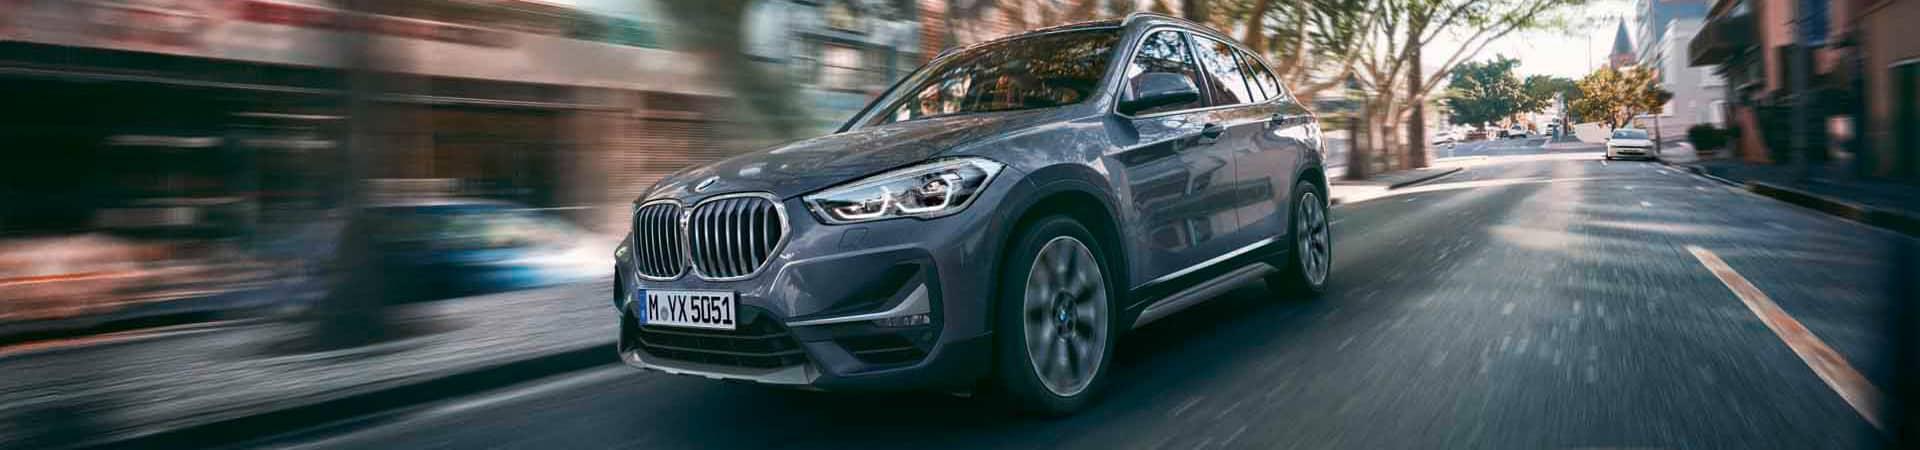 BMW X1 Angebot